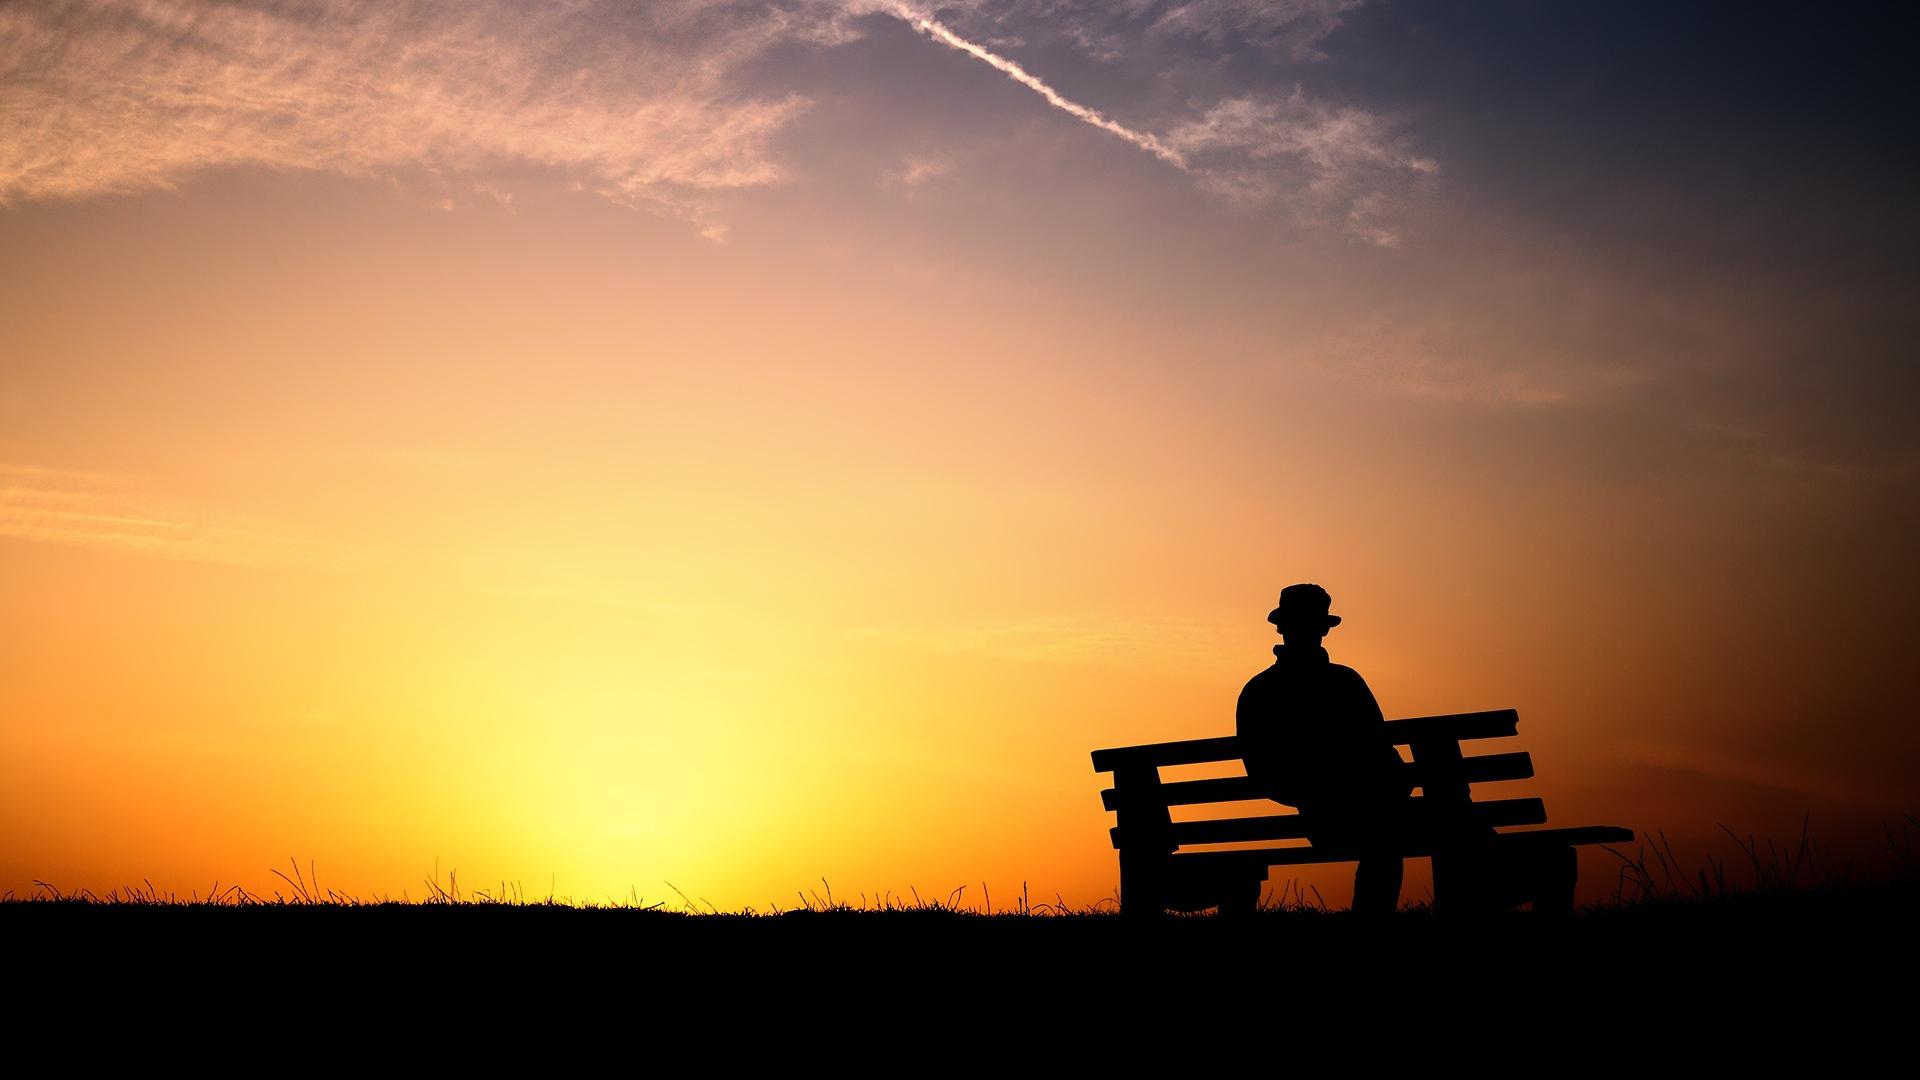 Super La solitude | Musulman Optimiste VH26